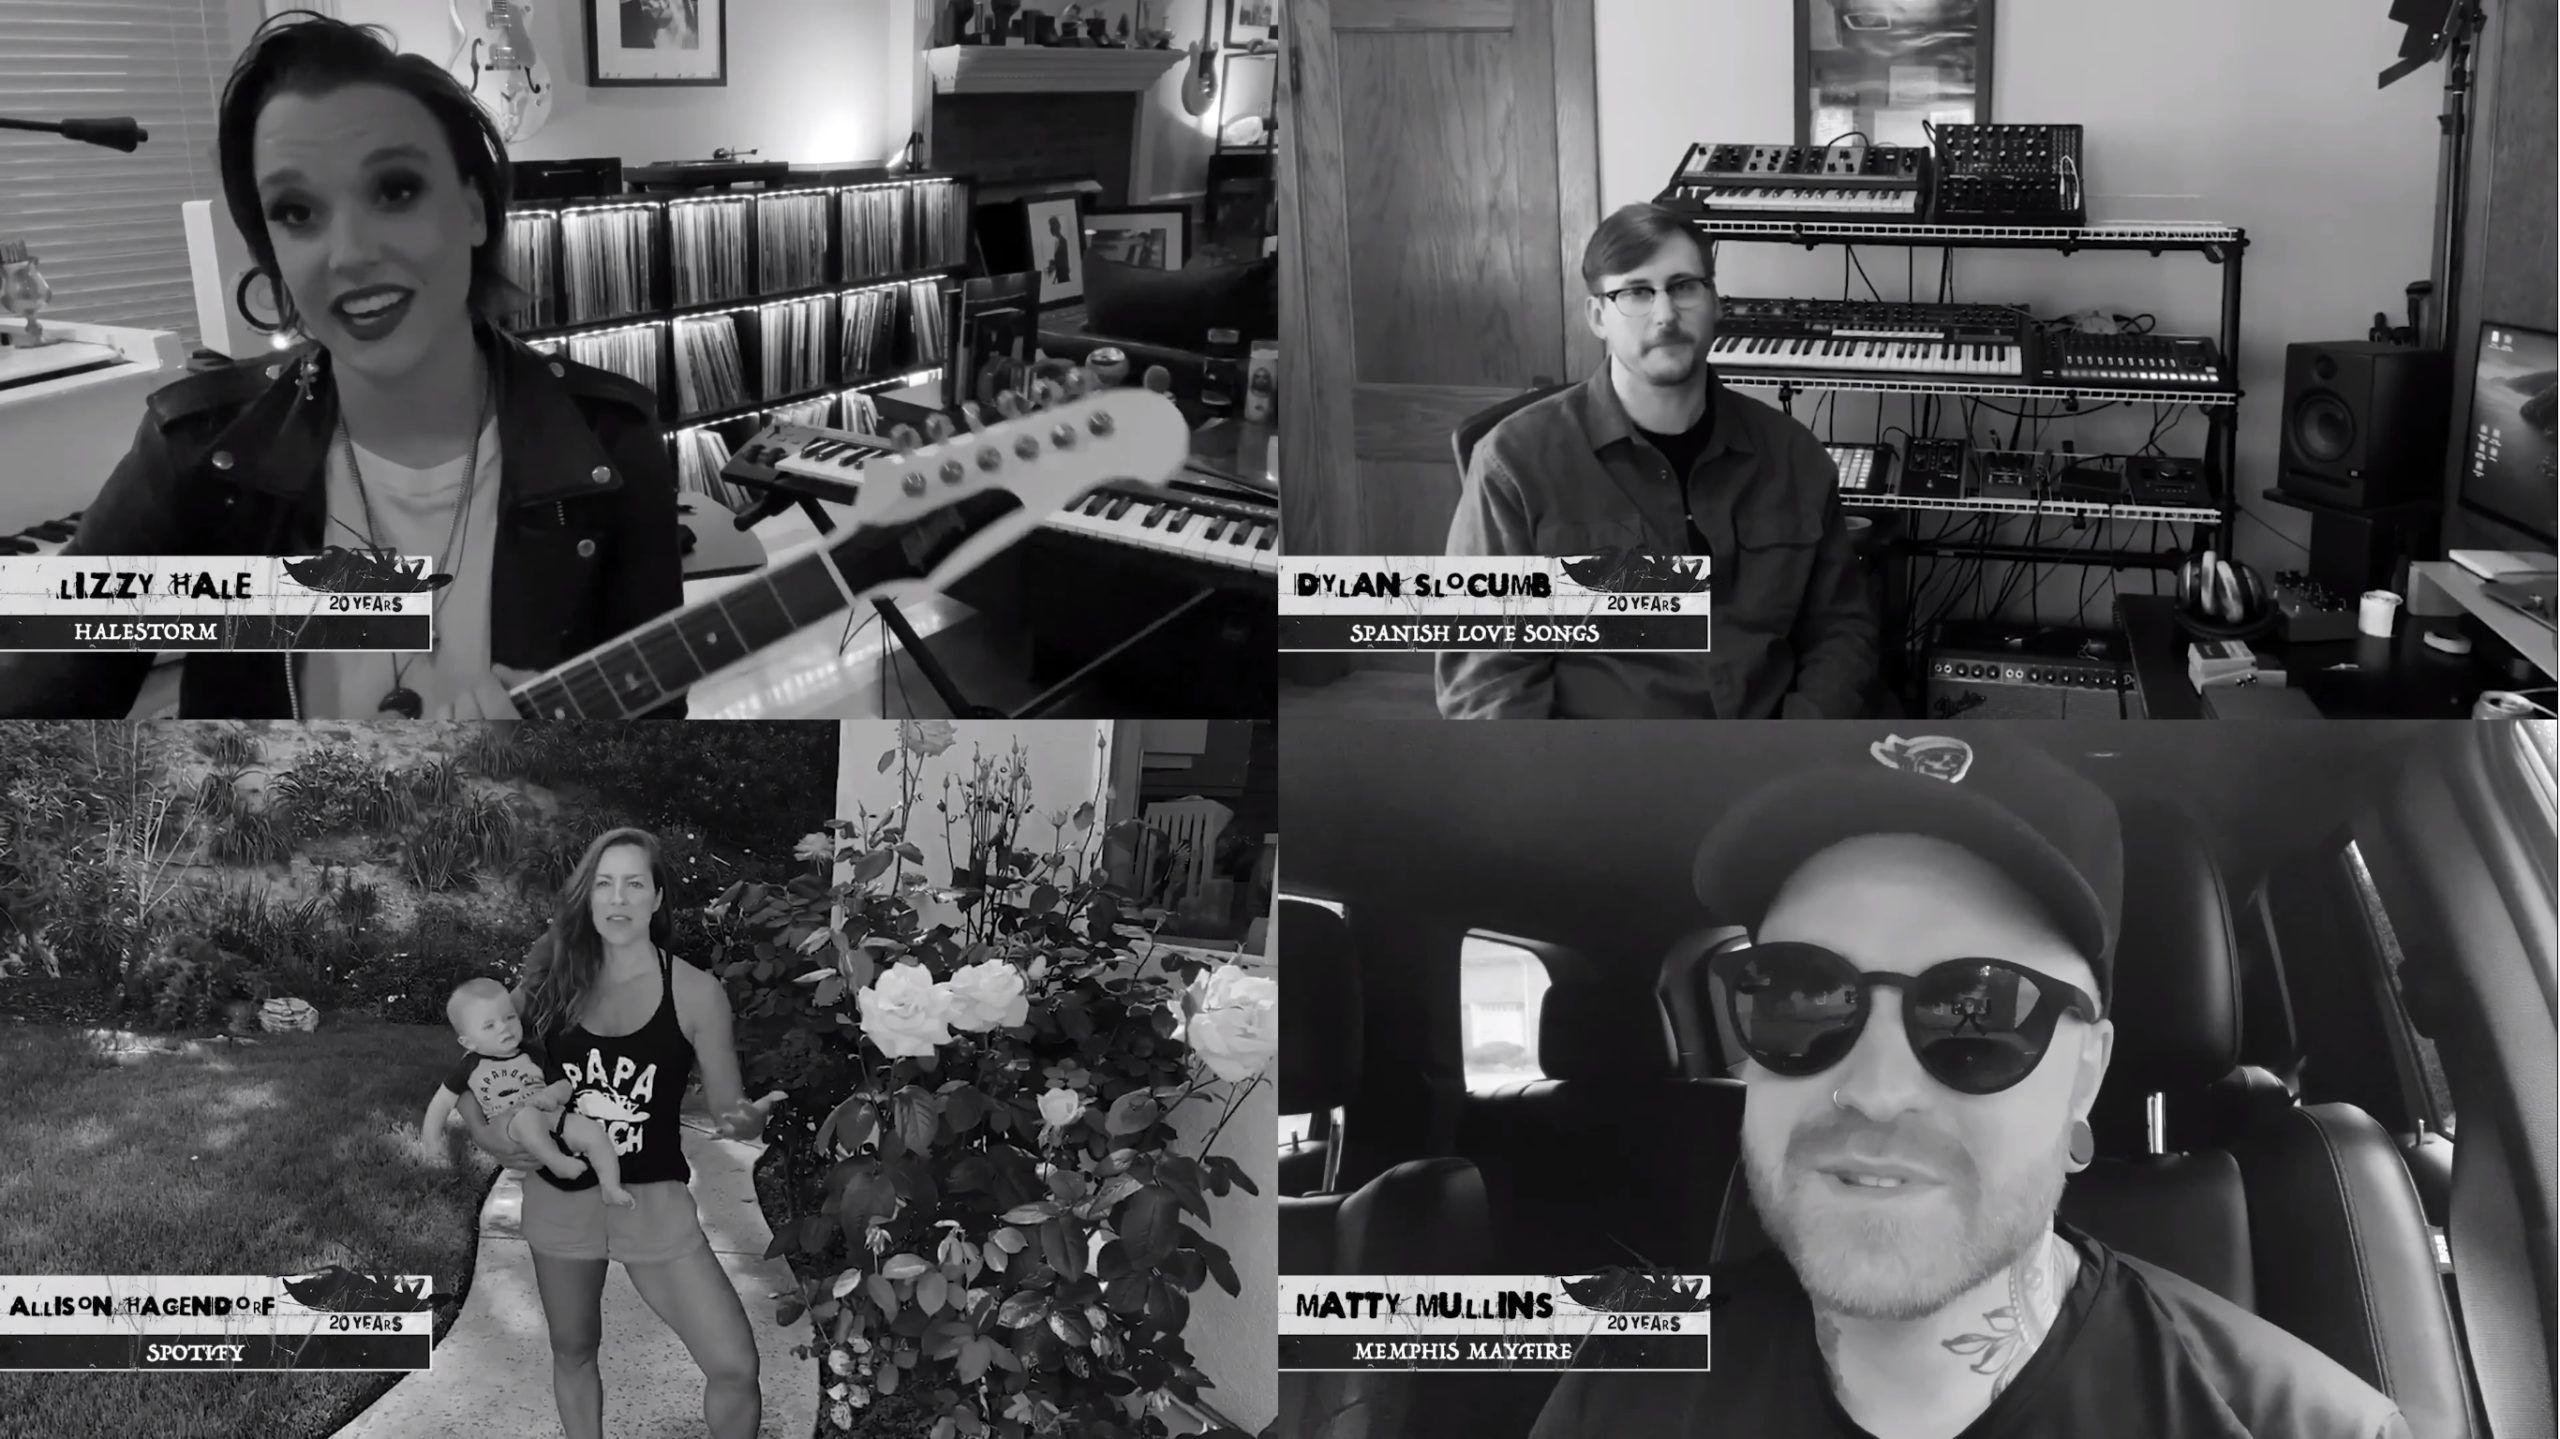 Papa Roach Halestorm Spanish Love Songs Memphis May Fire